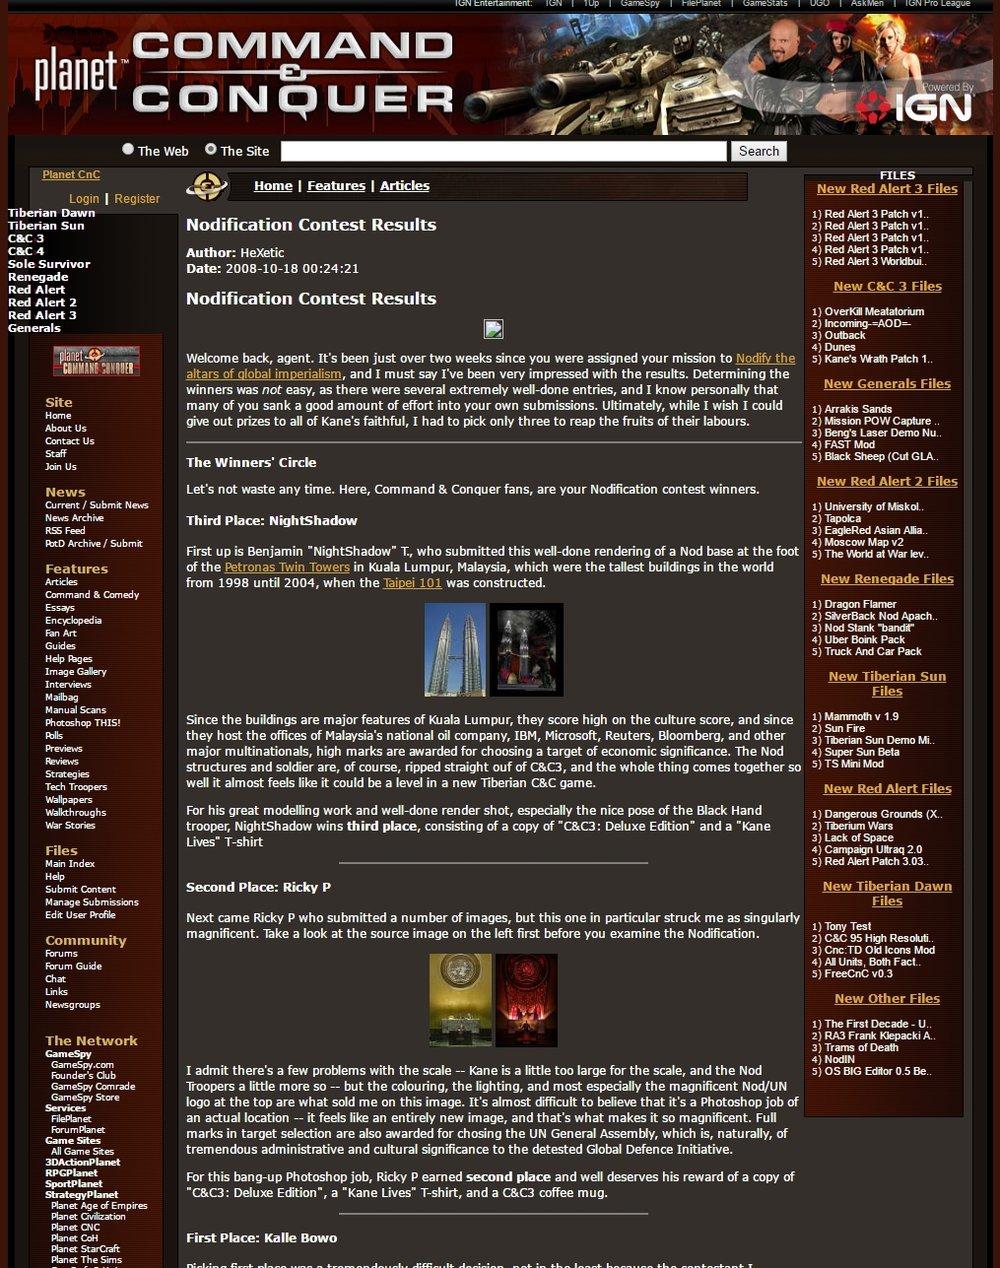 Screenshot taken using the Internet Archive: Wayback Machine